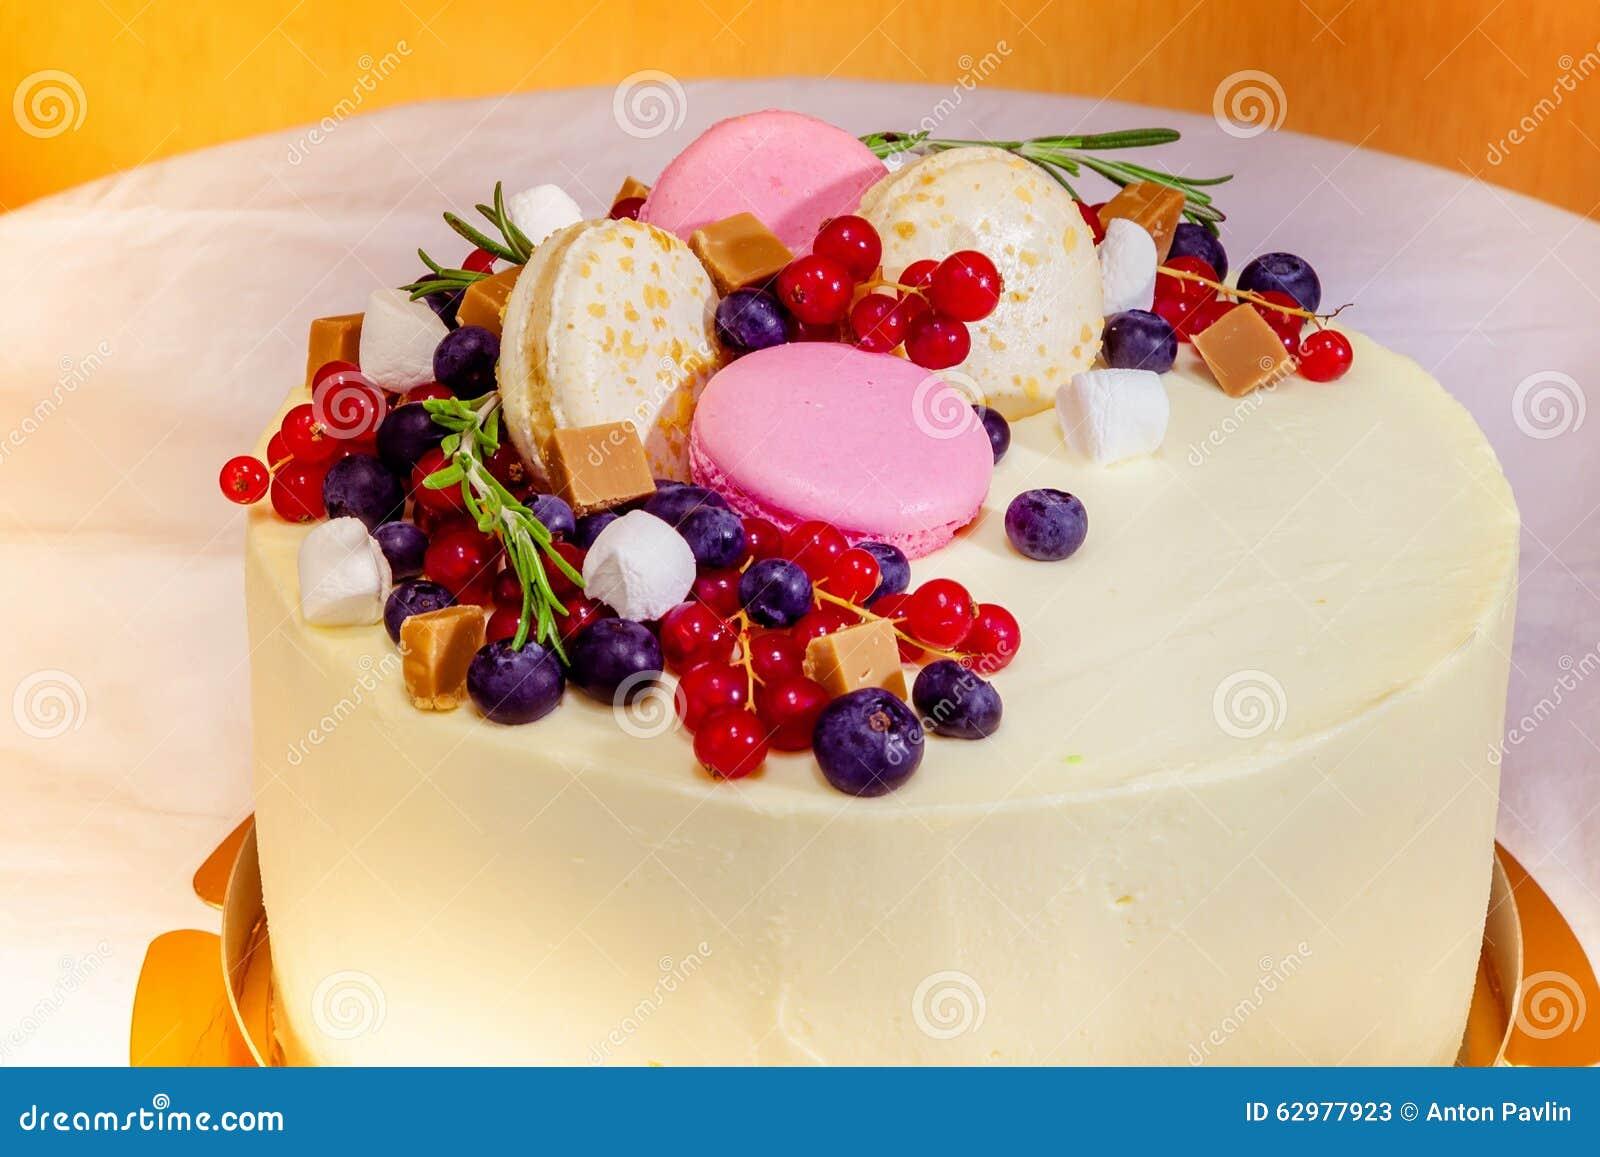 Birthday Cake With Cream Fresh Fruit And Berries Slide Stock Image